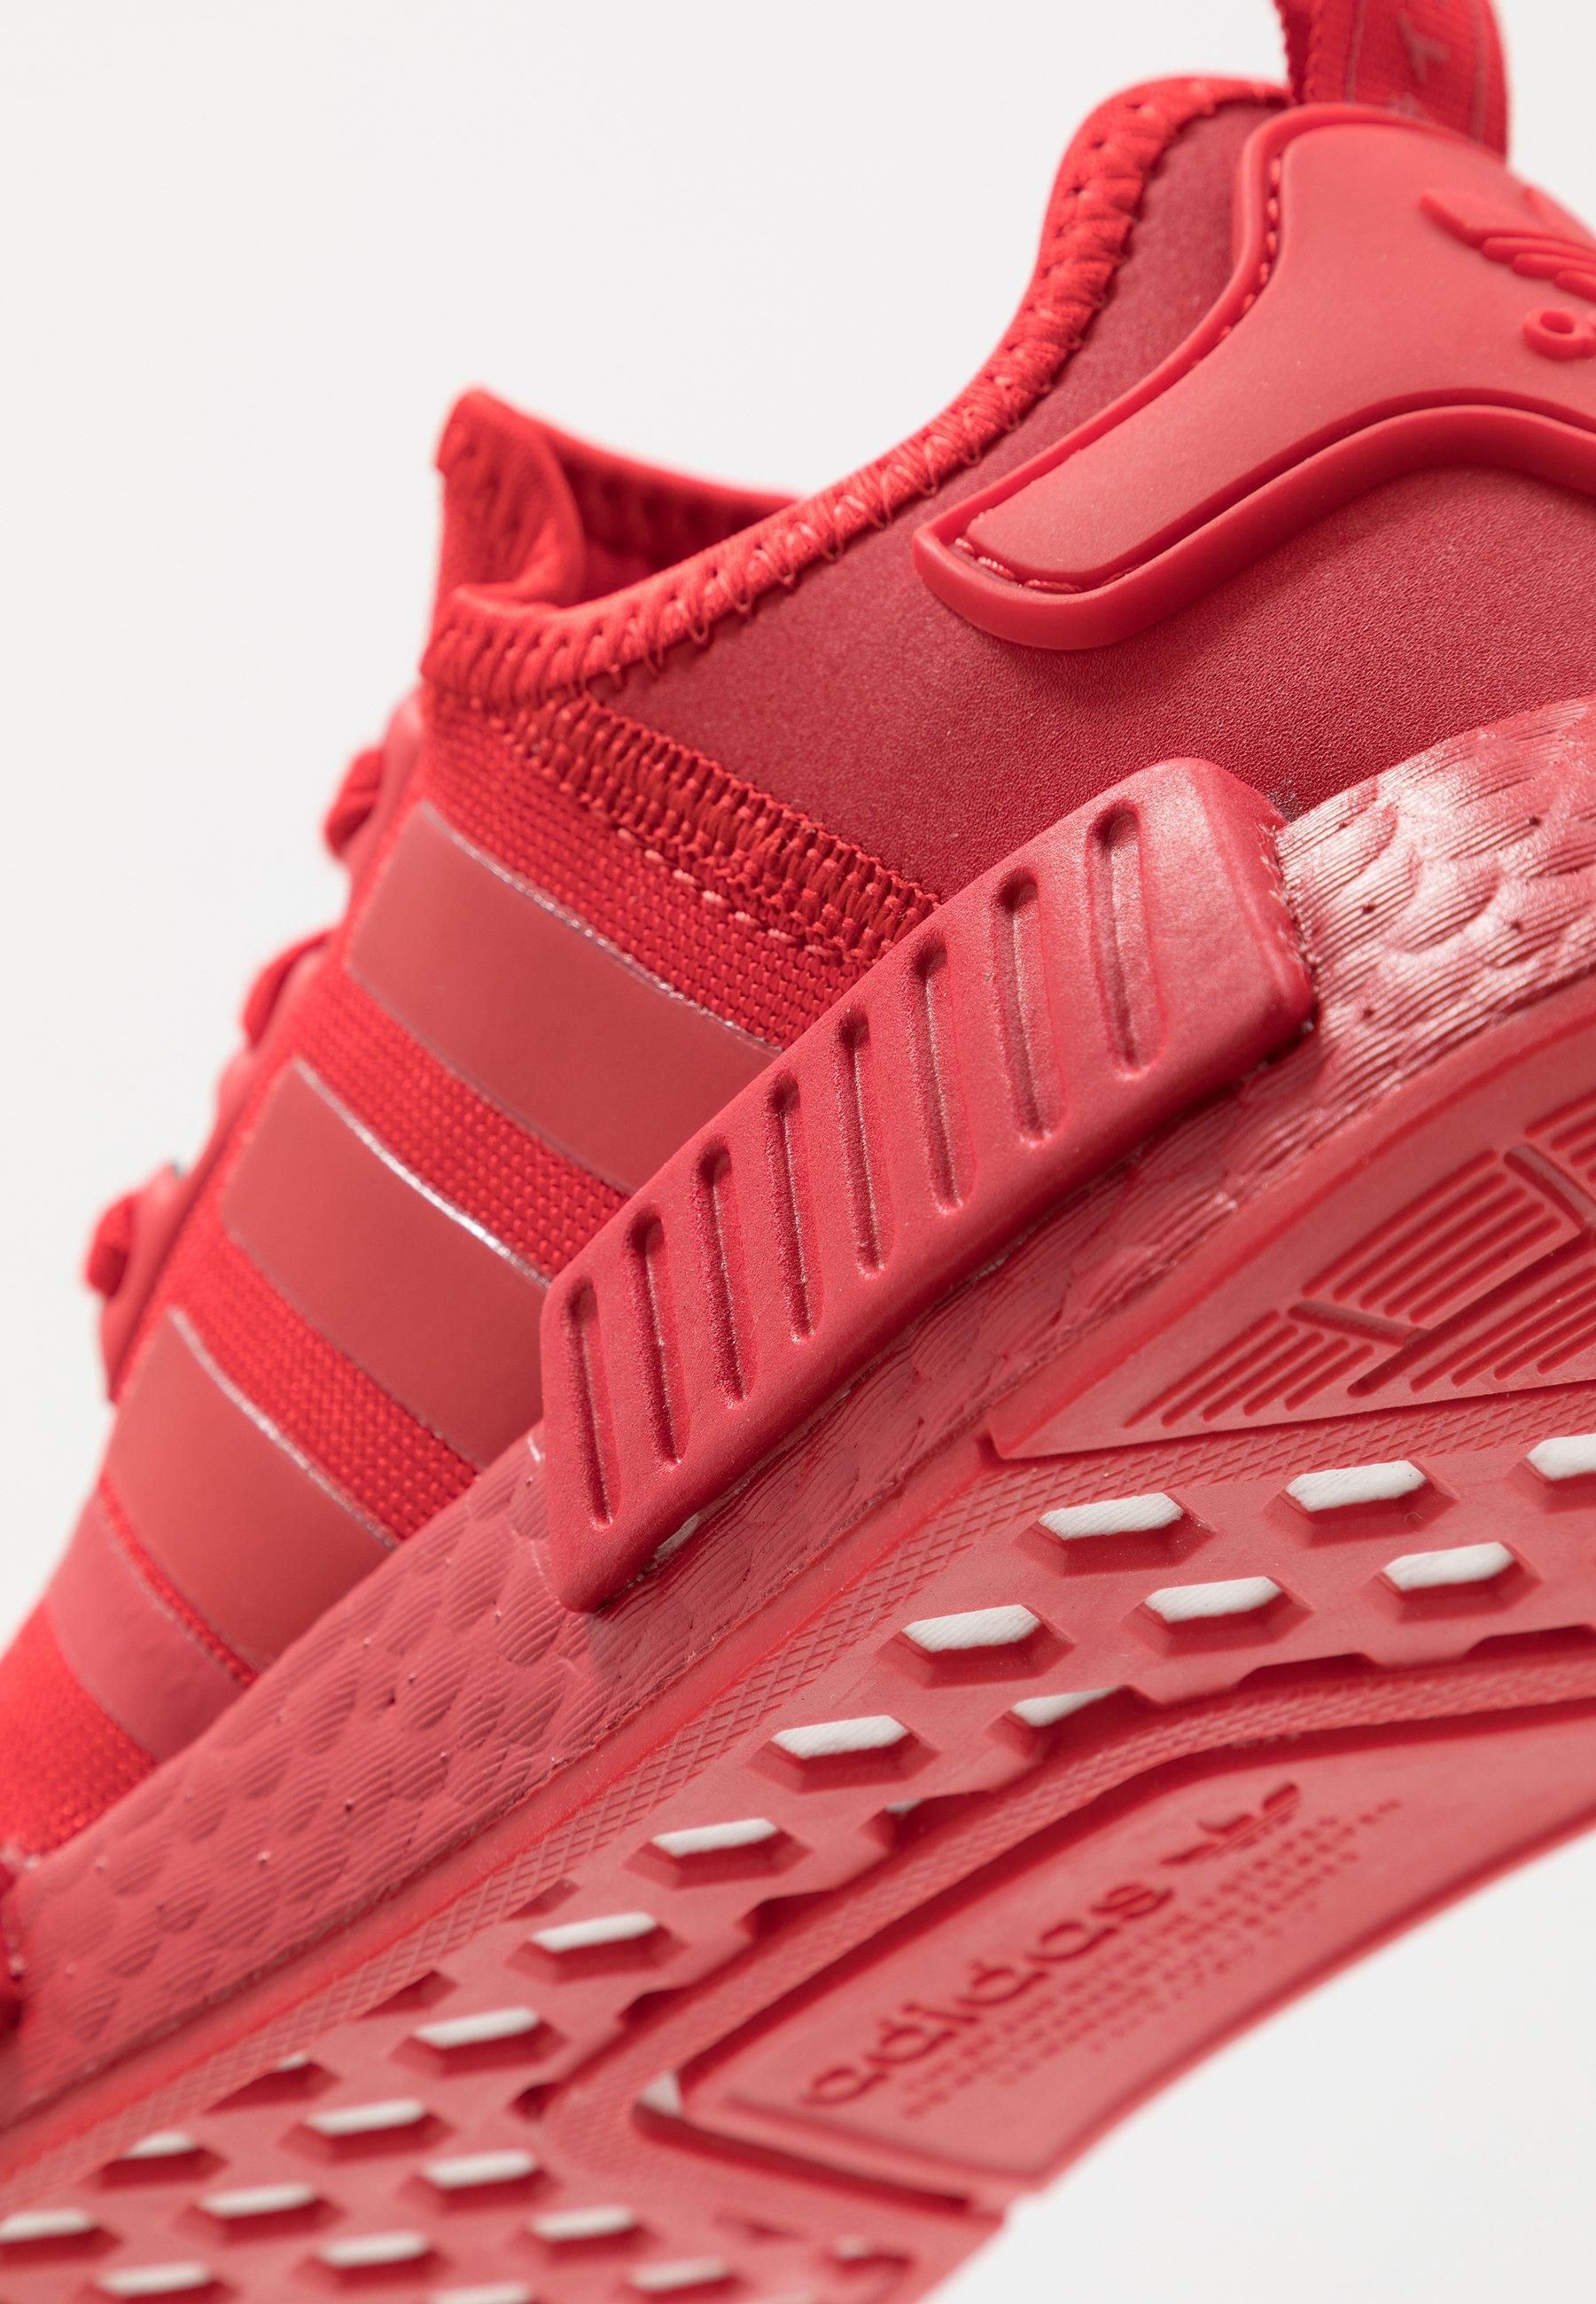 Adidas Originals Nmd R1 - Joggesko Scarlet/rød